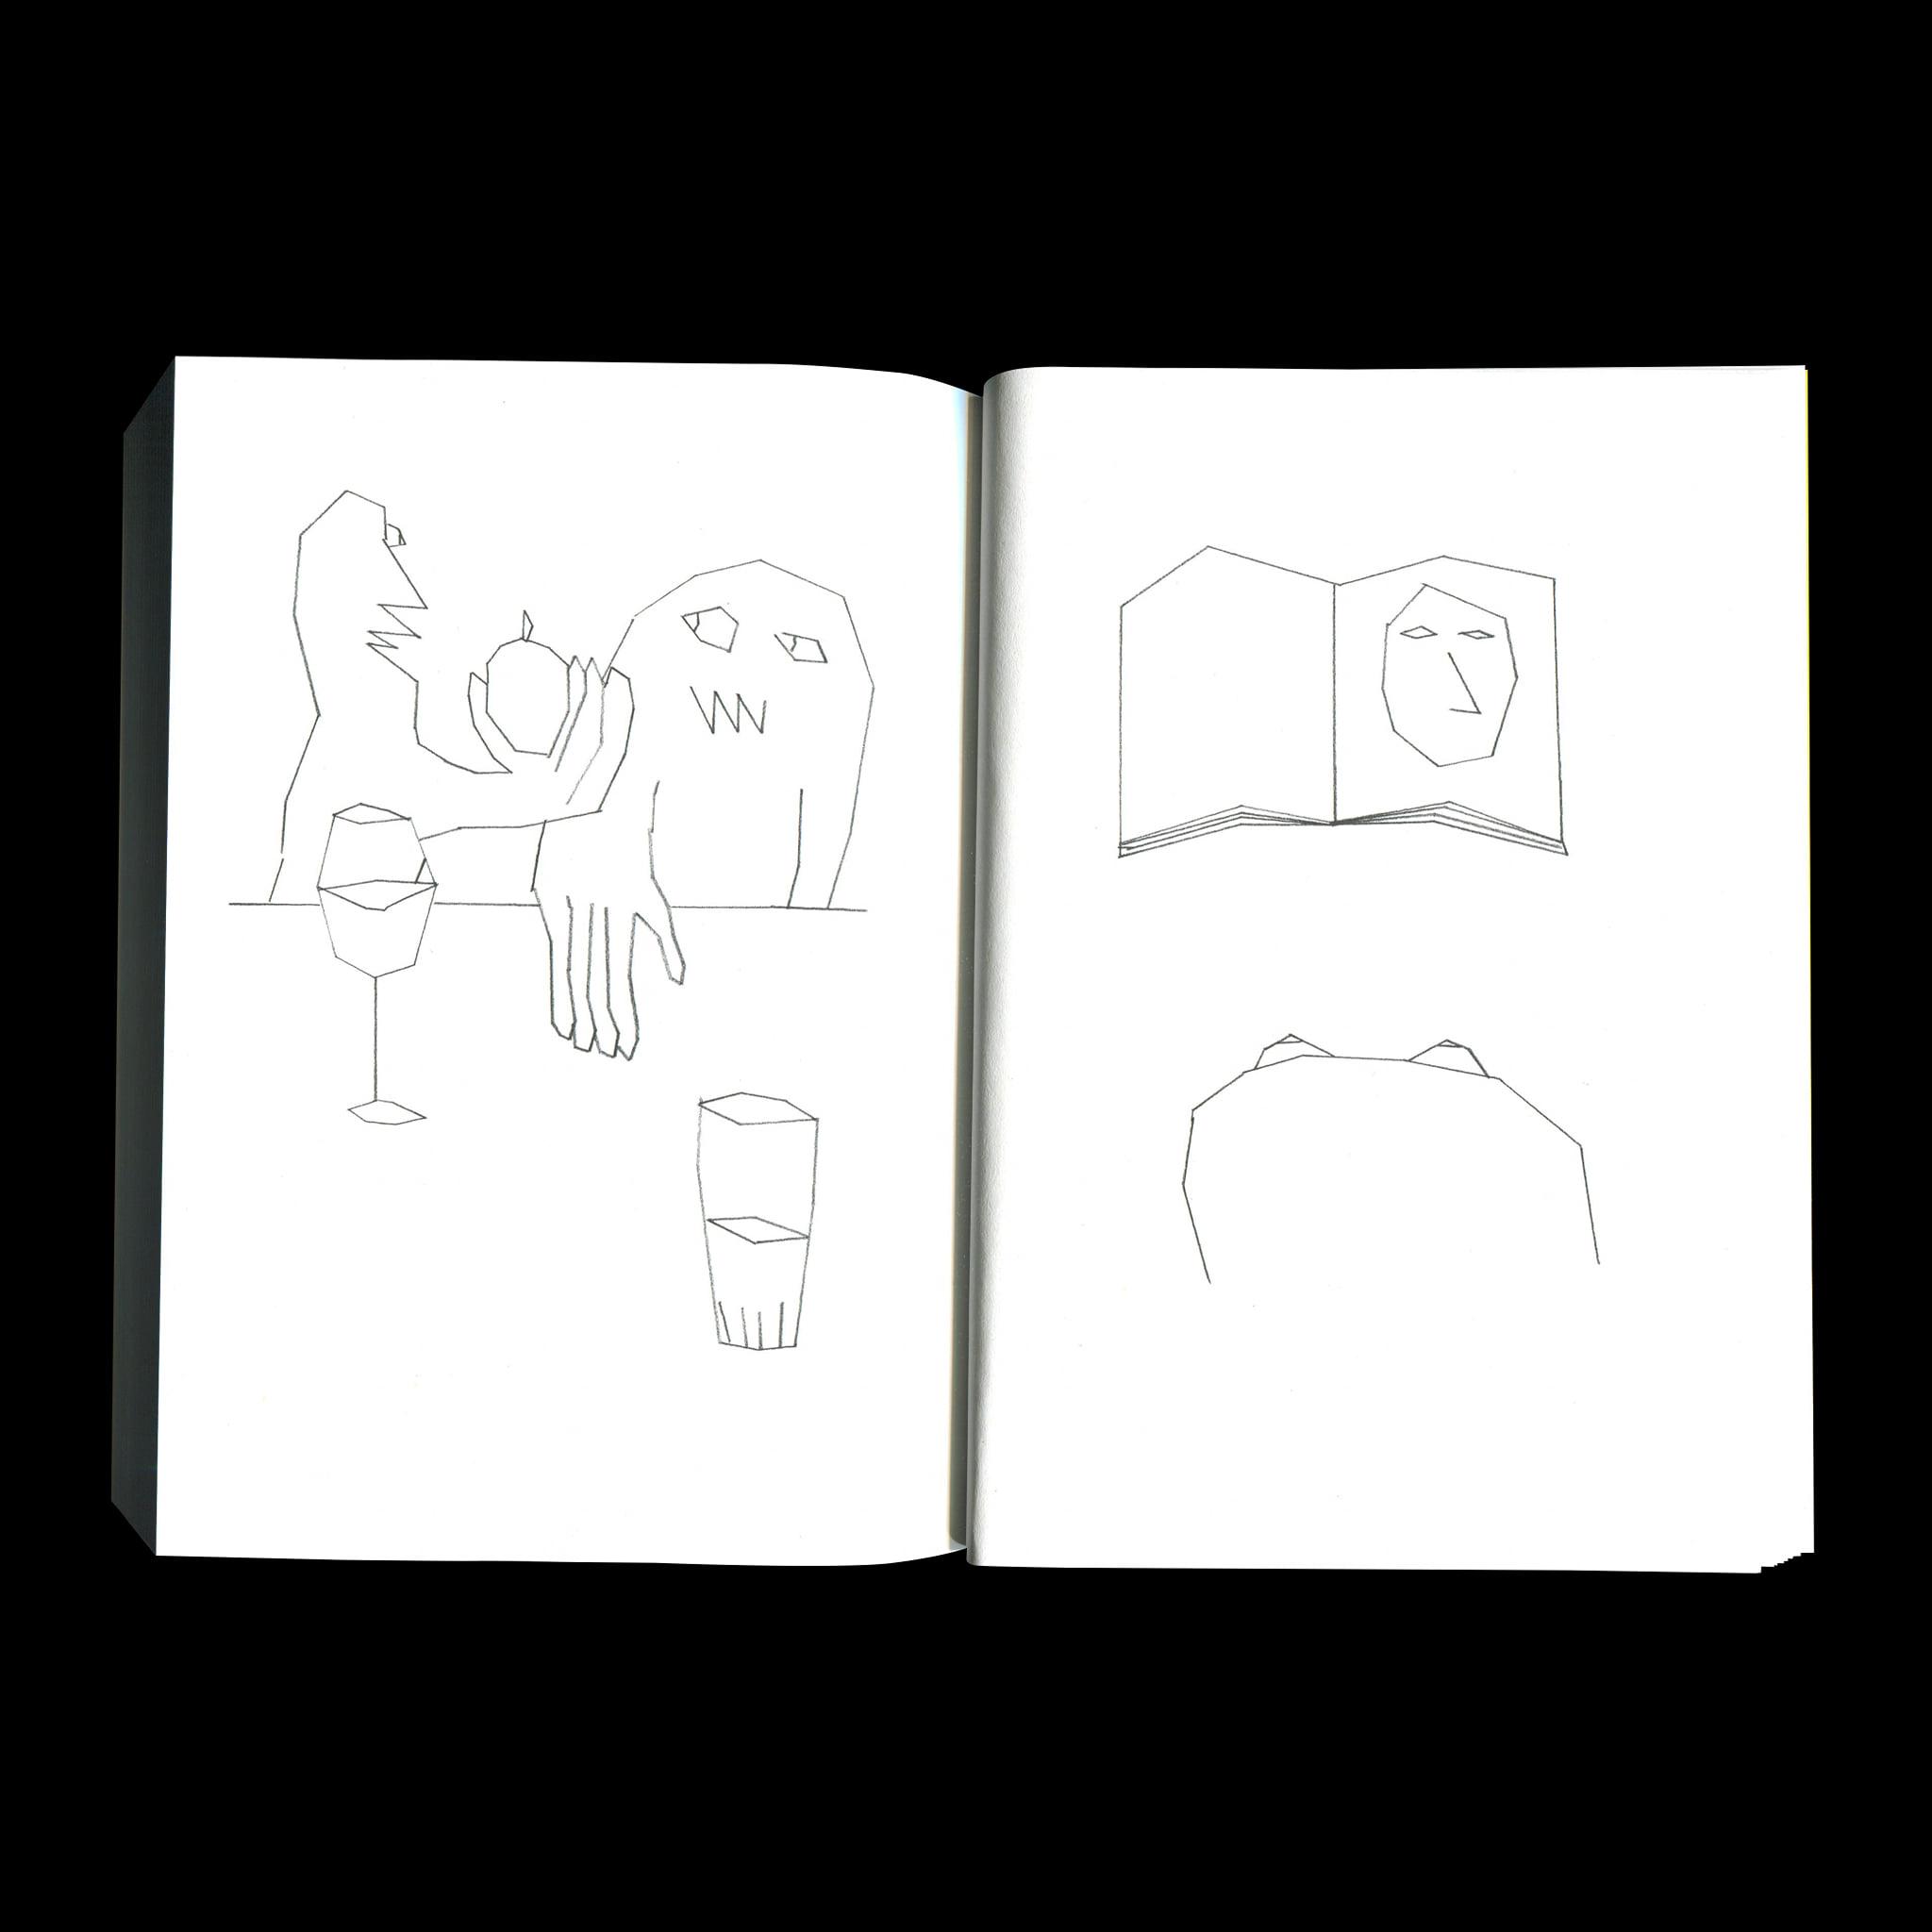 tim-colmant-exercices-de-dessin-01